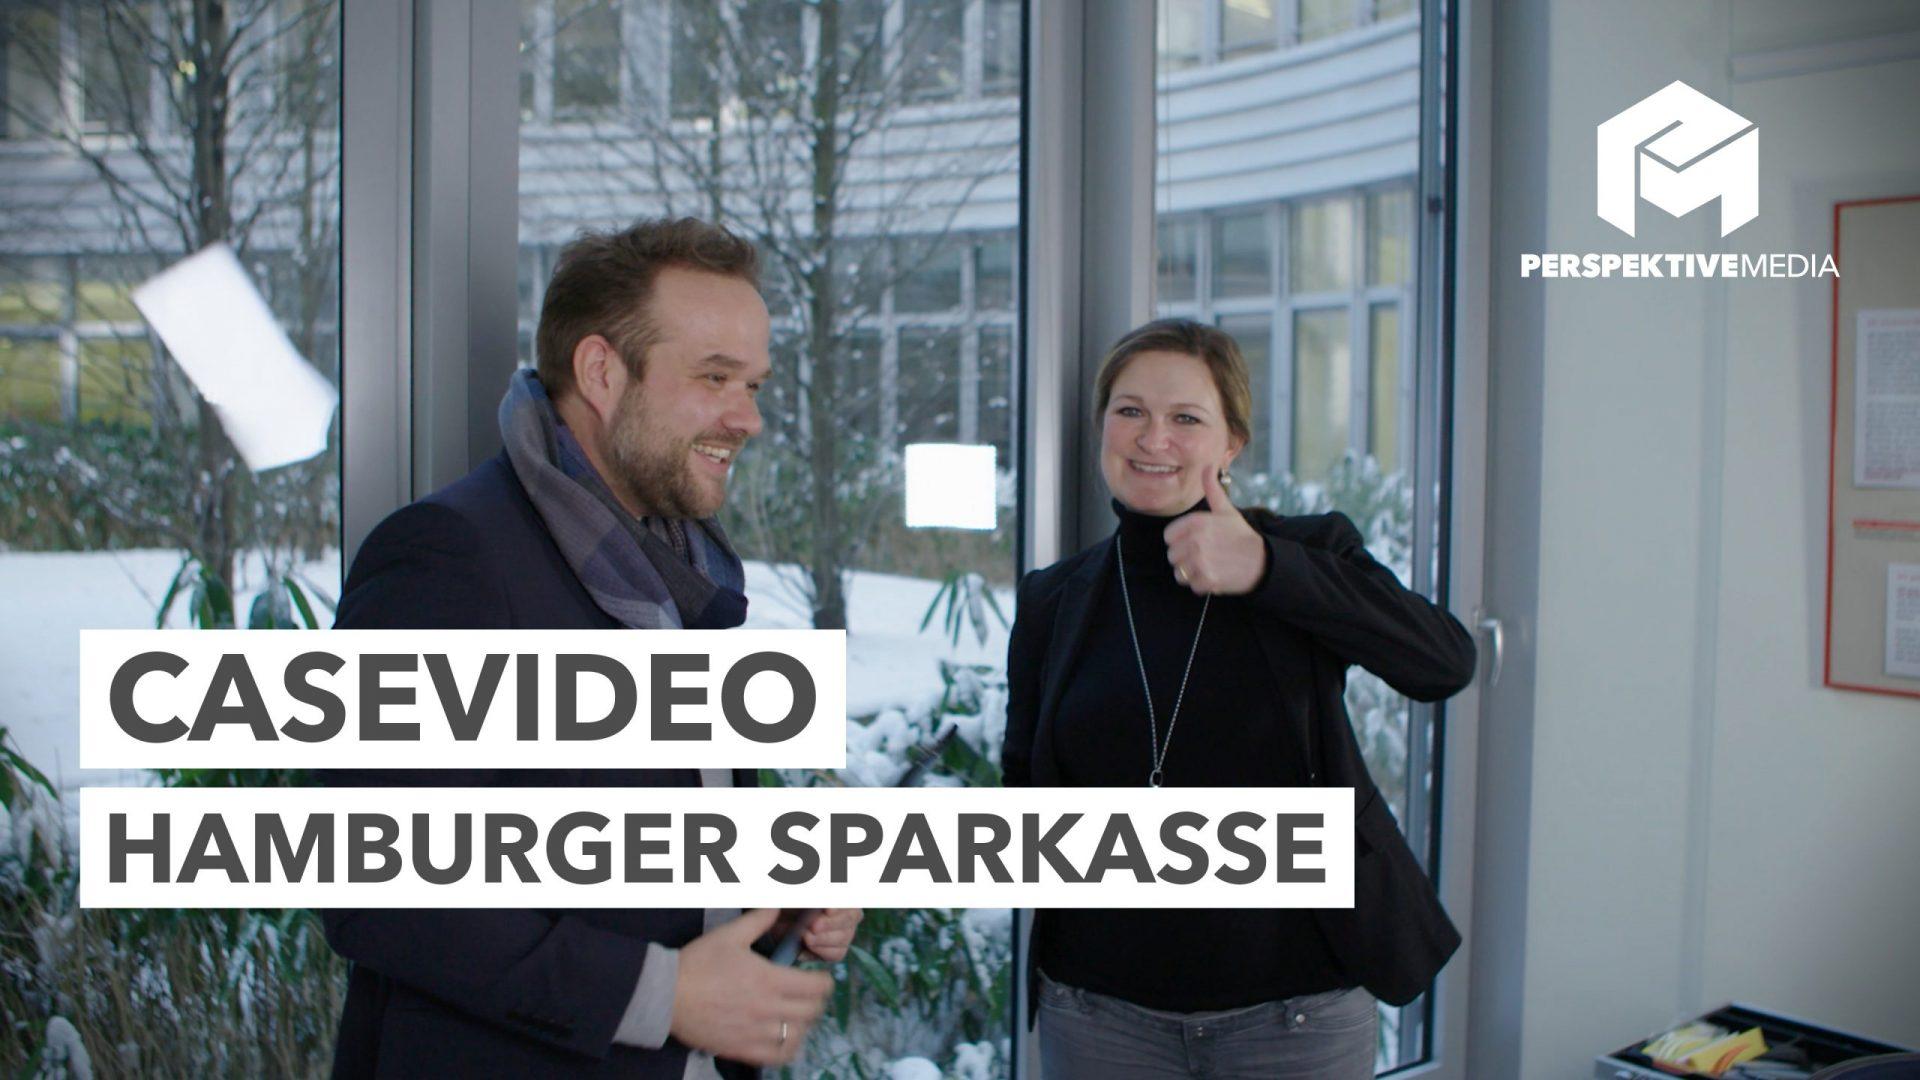 Casevideo_Hamburger Sparkasse